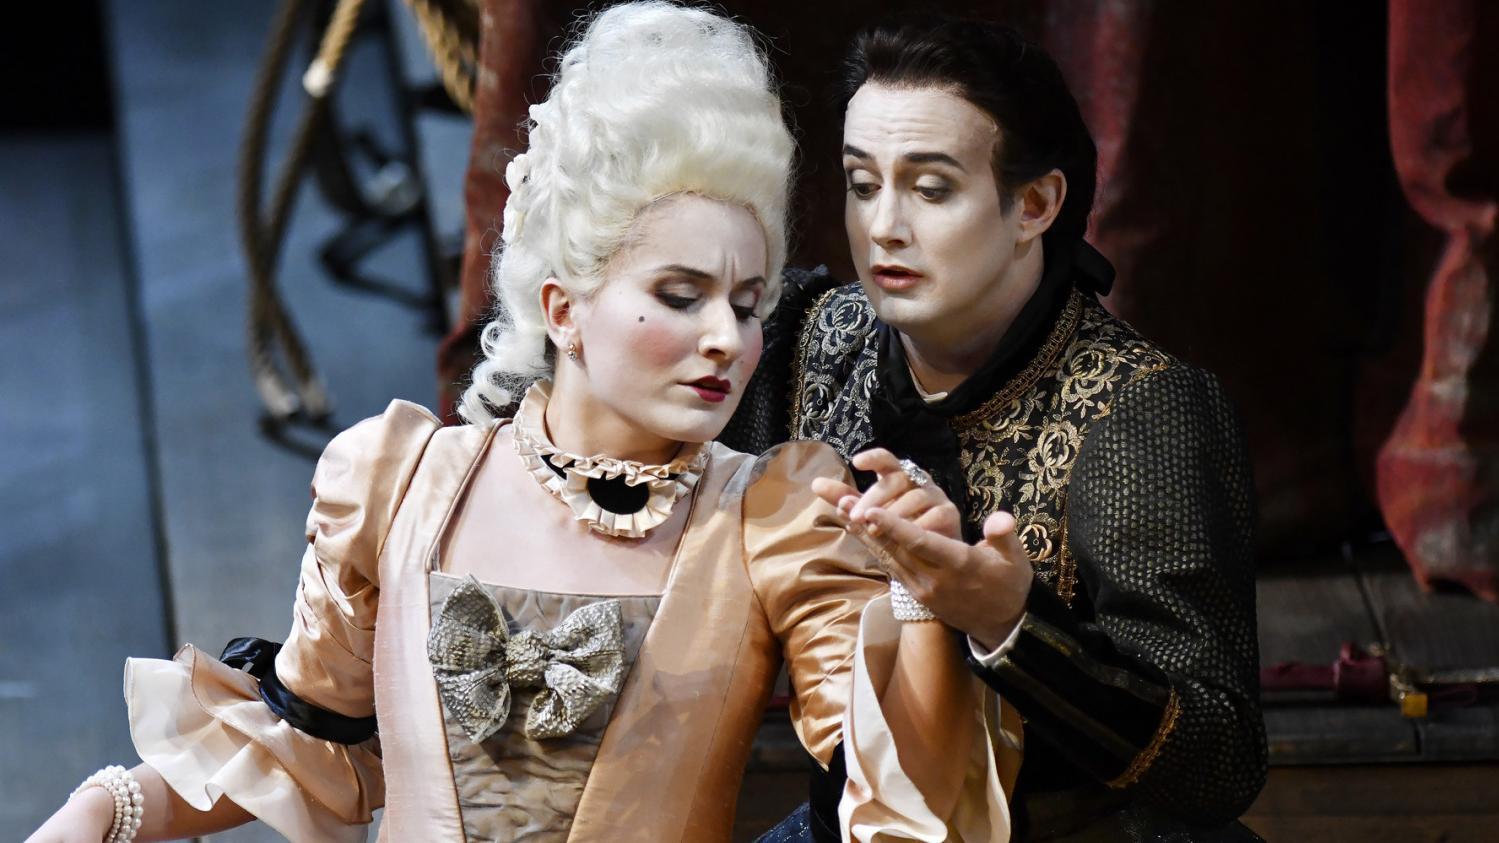 Opéra en replay : Semiramide de Rossini avec Franco Fagioli à l'Opéra National de Lorraine